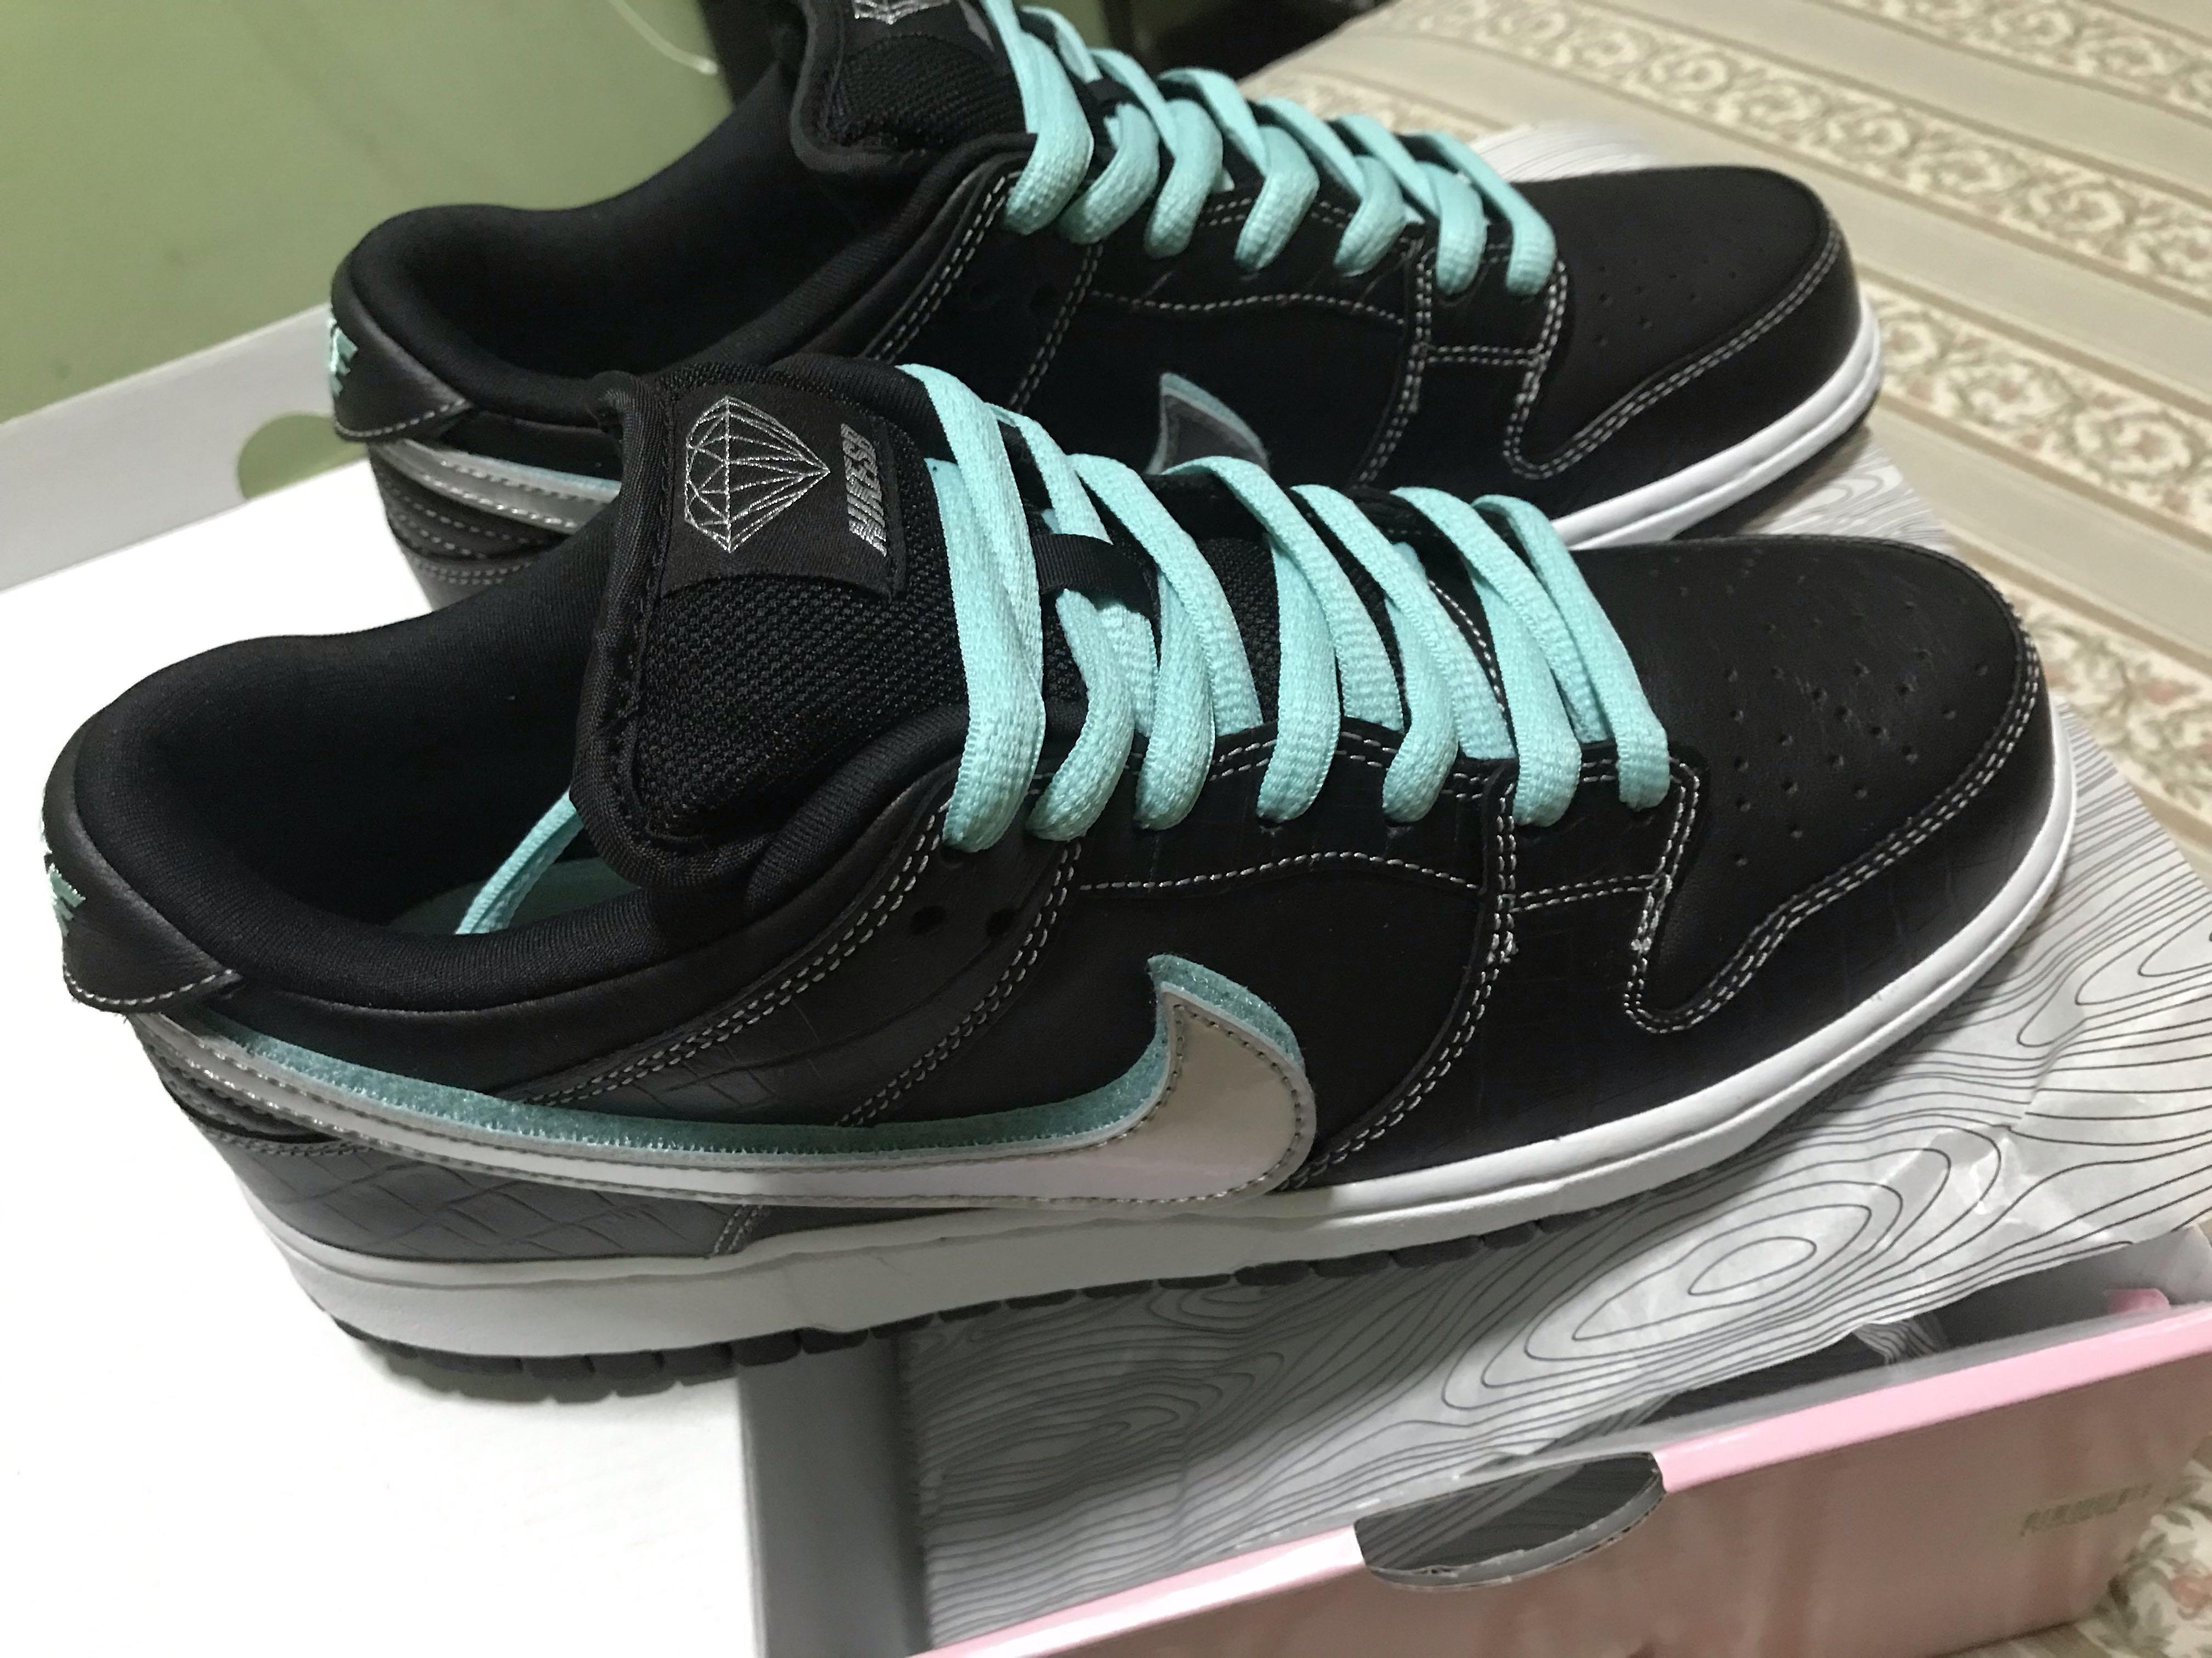 534eedaa78 Nike sb Diamond supply co, Men's Fashion, Footwear, Sneakers on ...